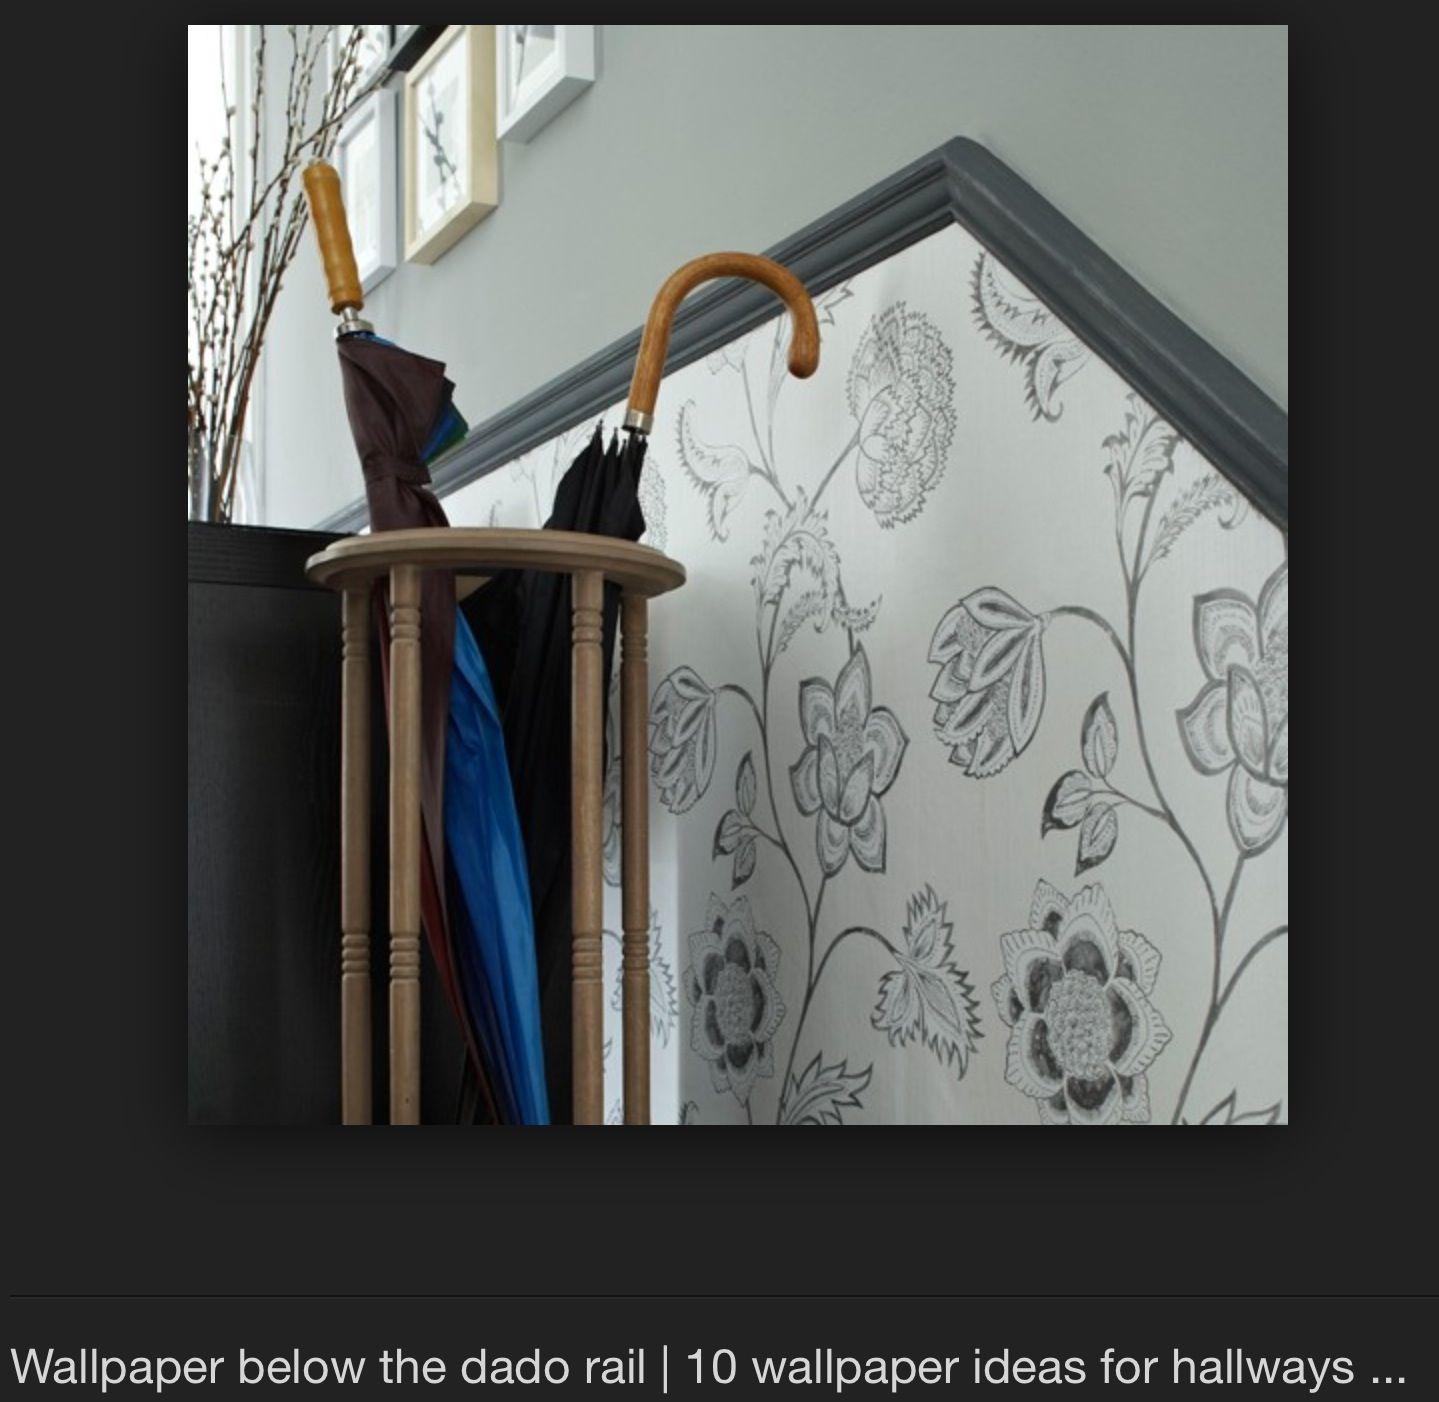 Wallpaper Below Dado Rail